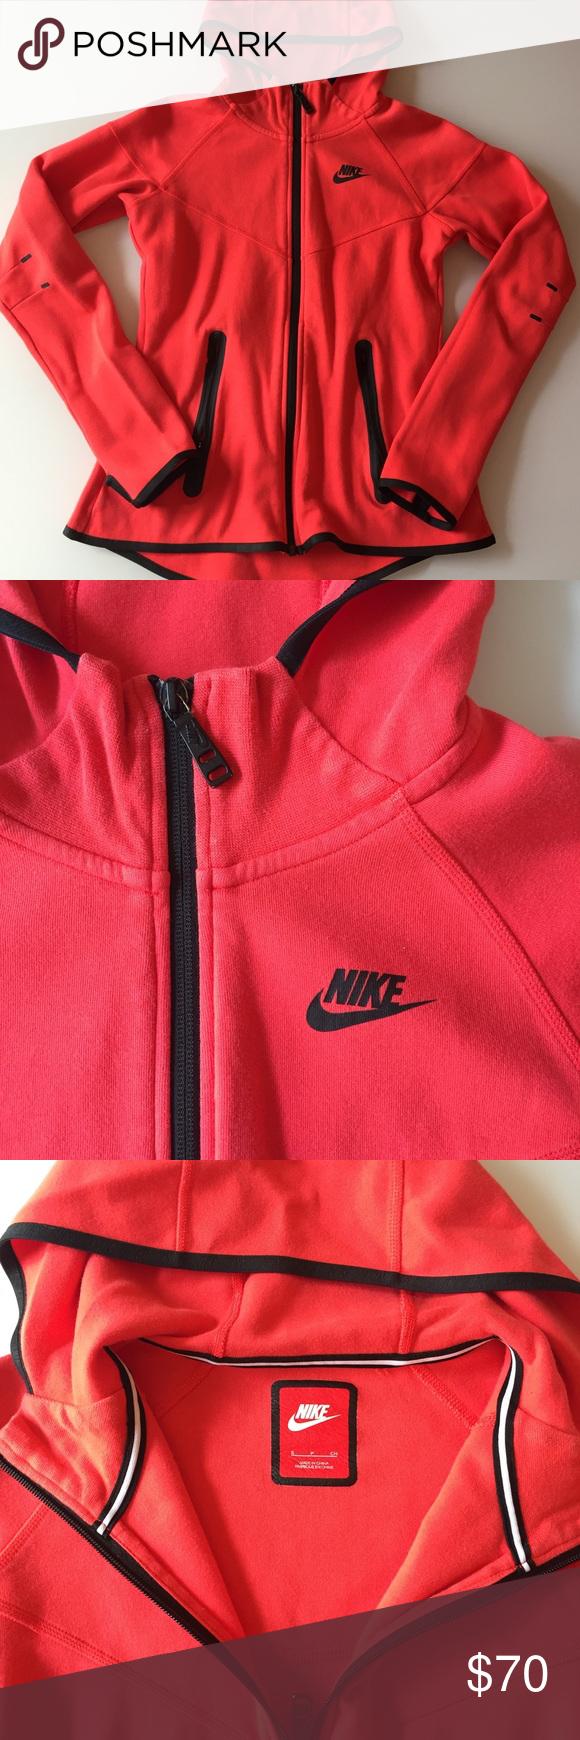 Nike womenus tech fleece flaws sweatshirt and customer support